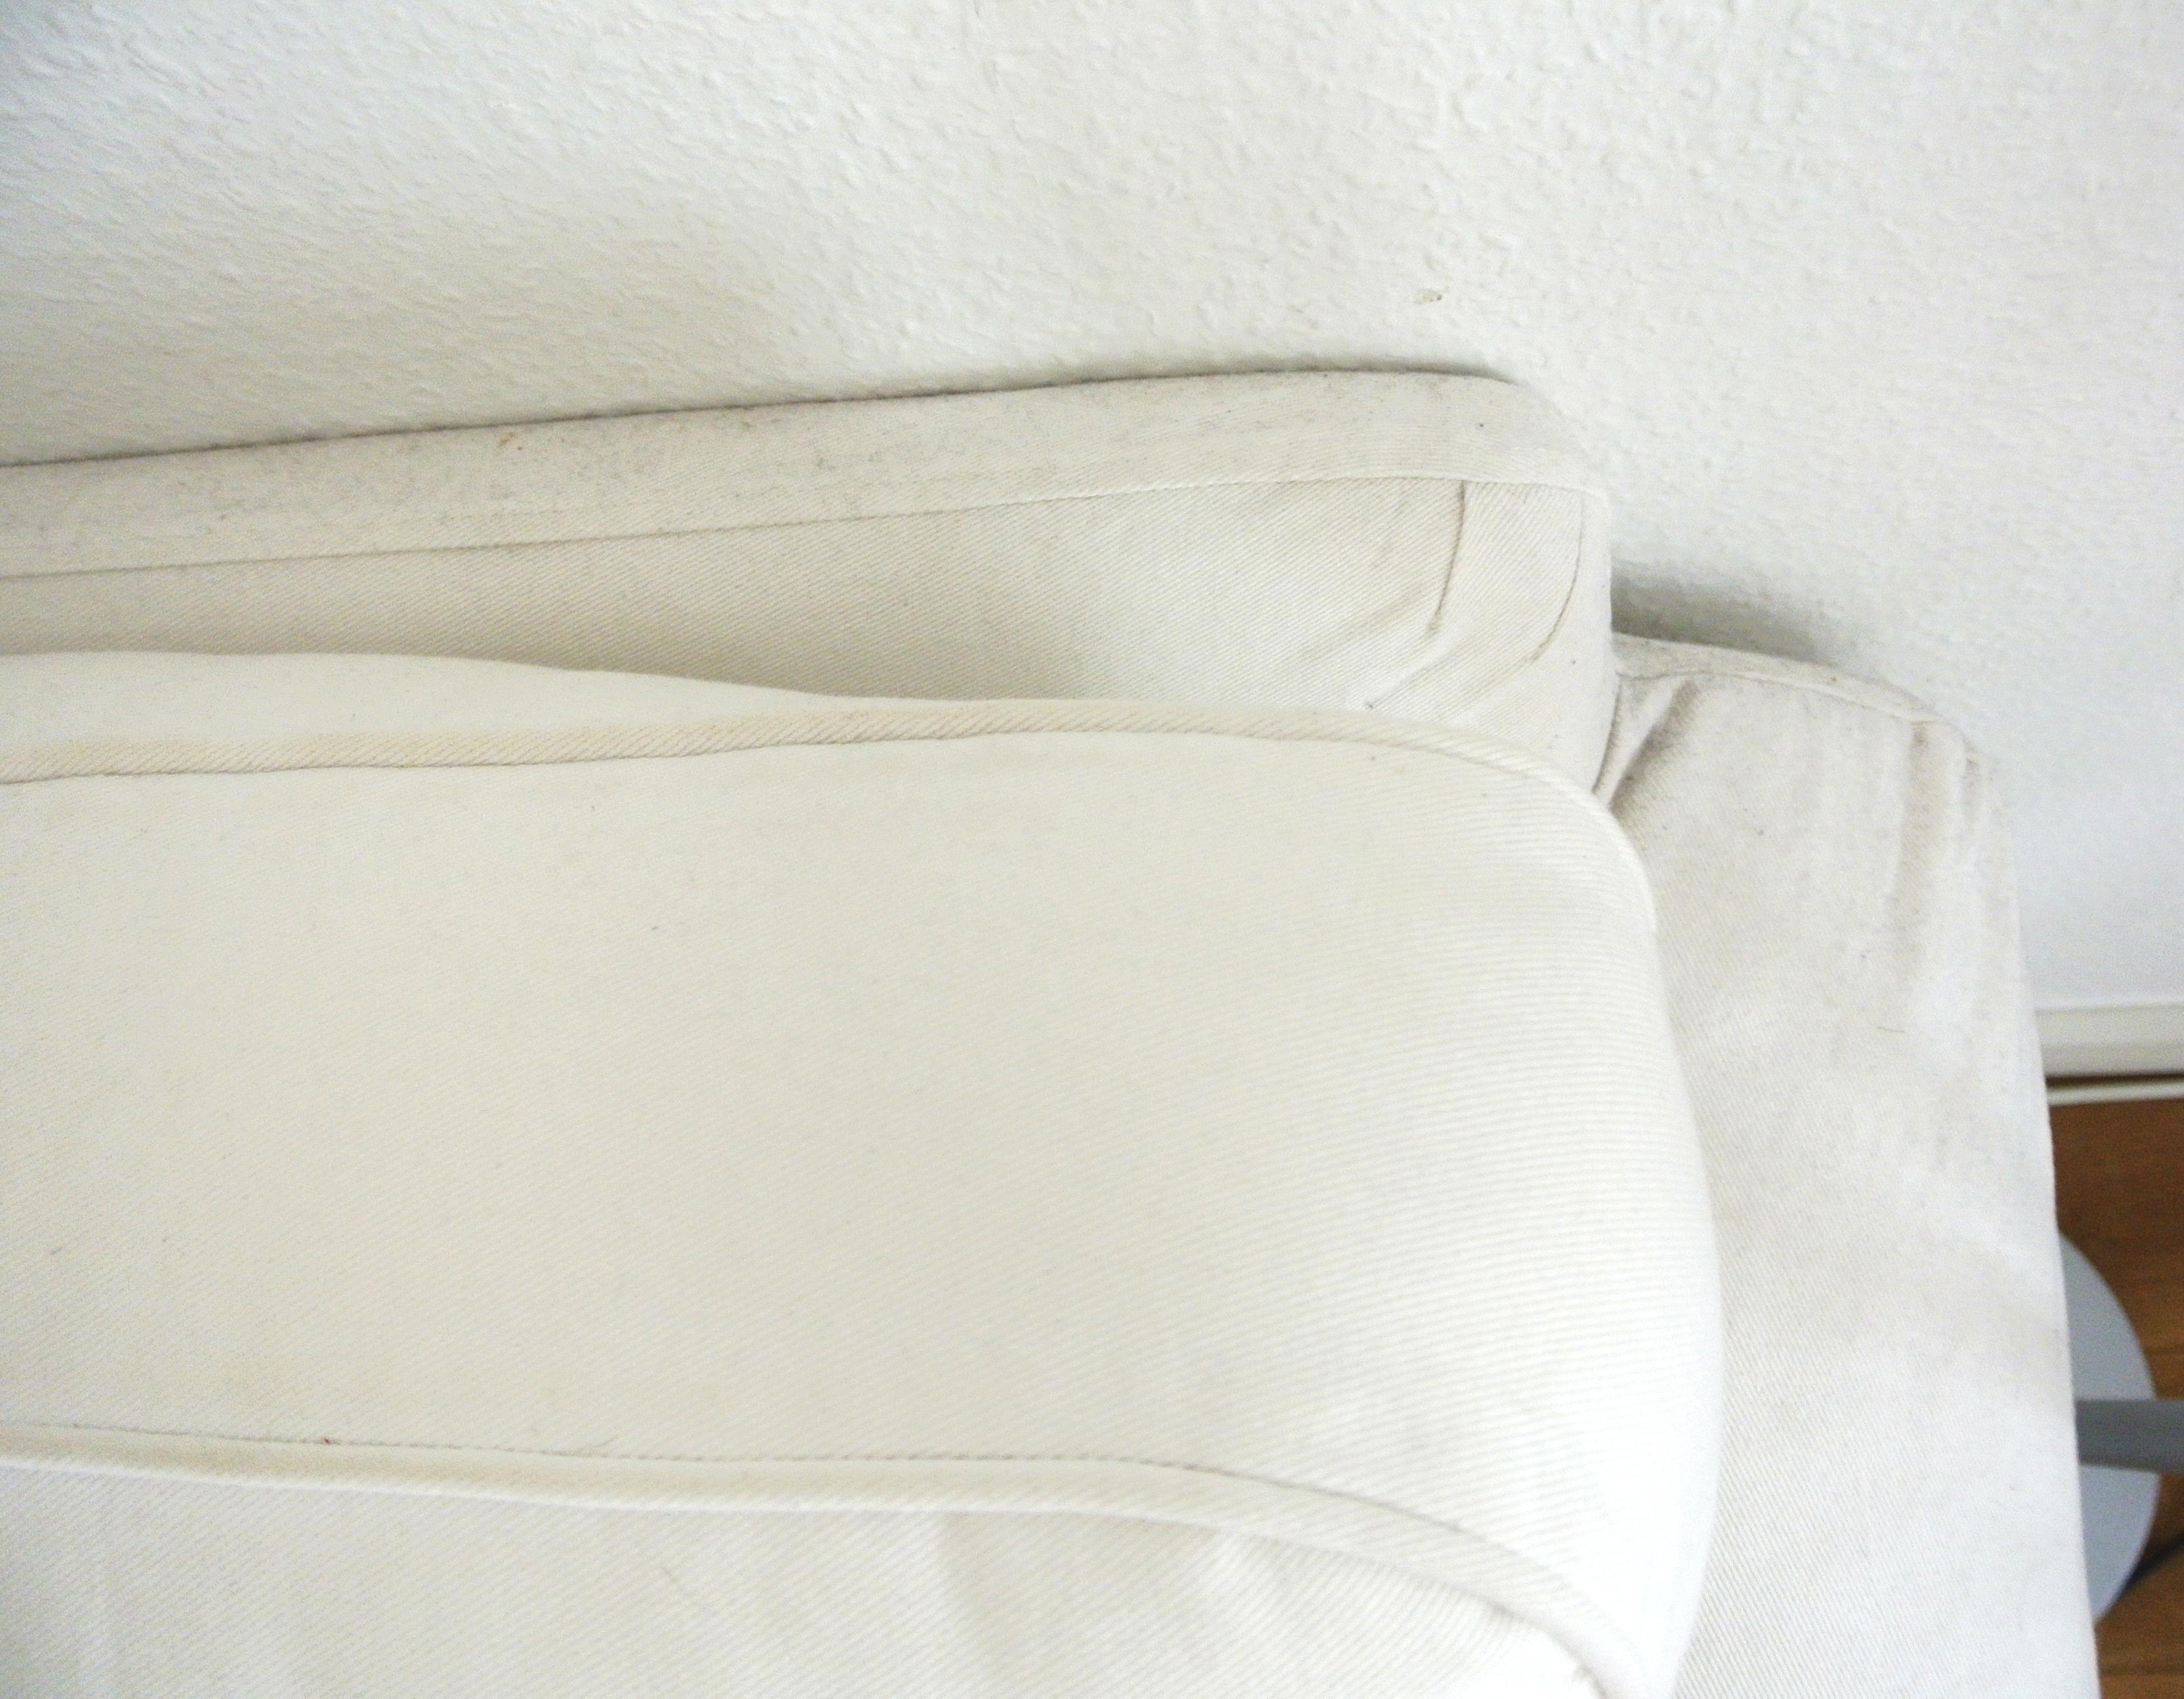 polster neue with polster awesome polster reinigen filzstift auf lehne nachher with polster. Black Bedroom Furniture Sets. Home Design Ideas